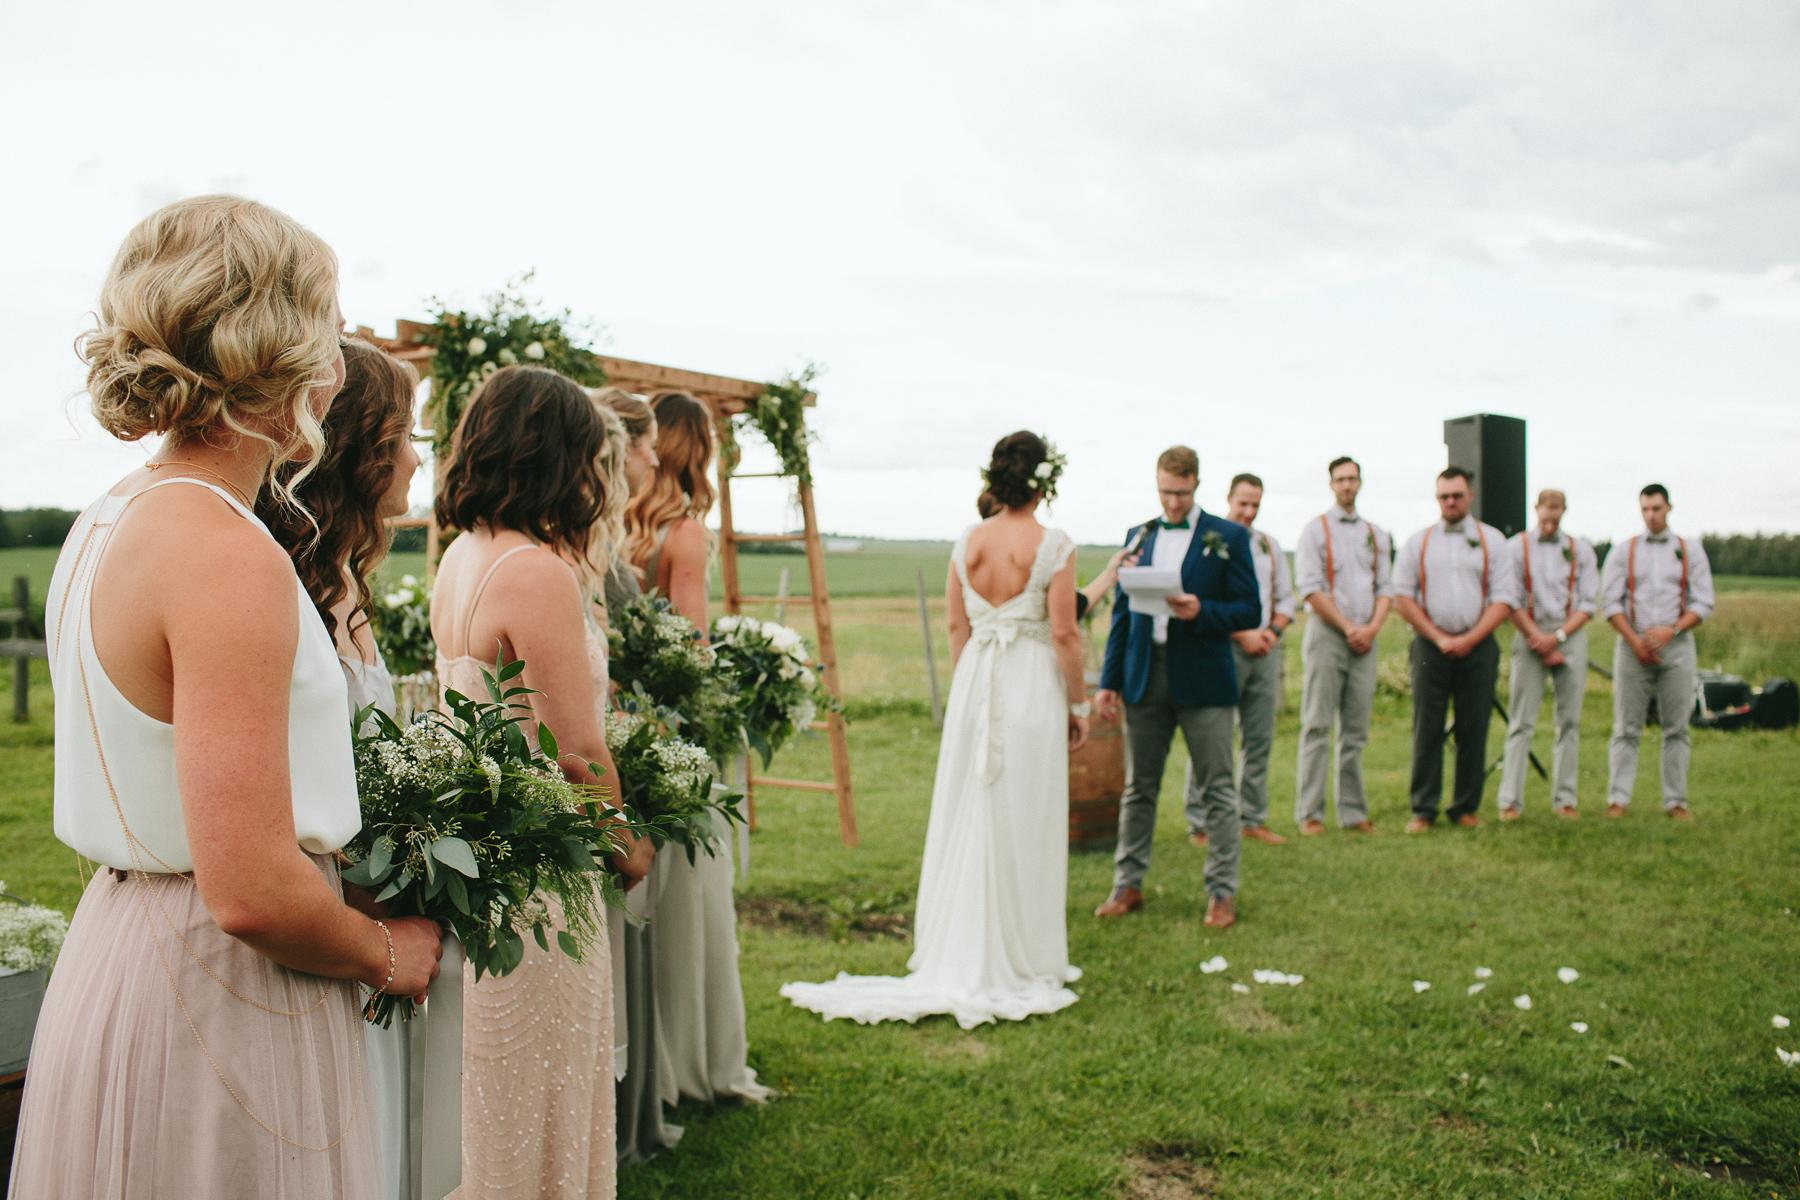 alberta-farm-wedding-photographer-rp-wj-127.jpg